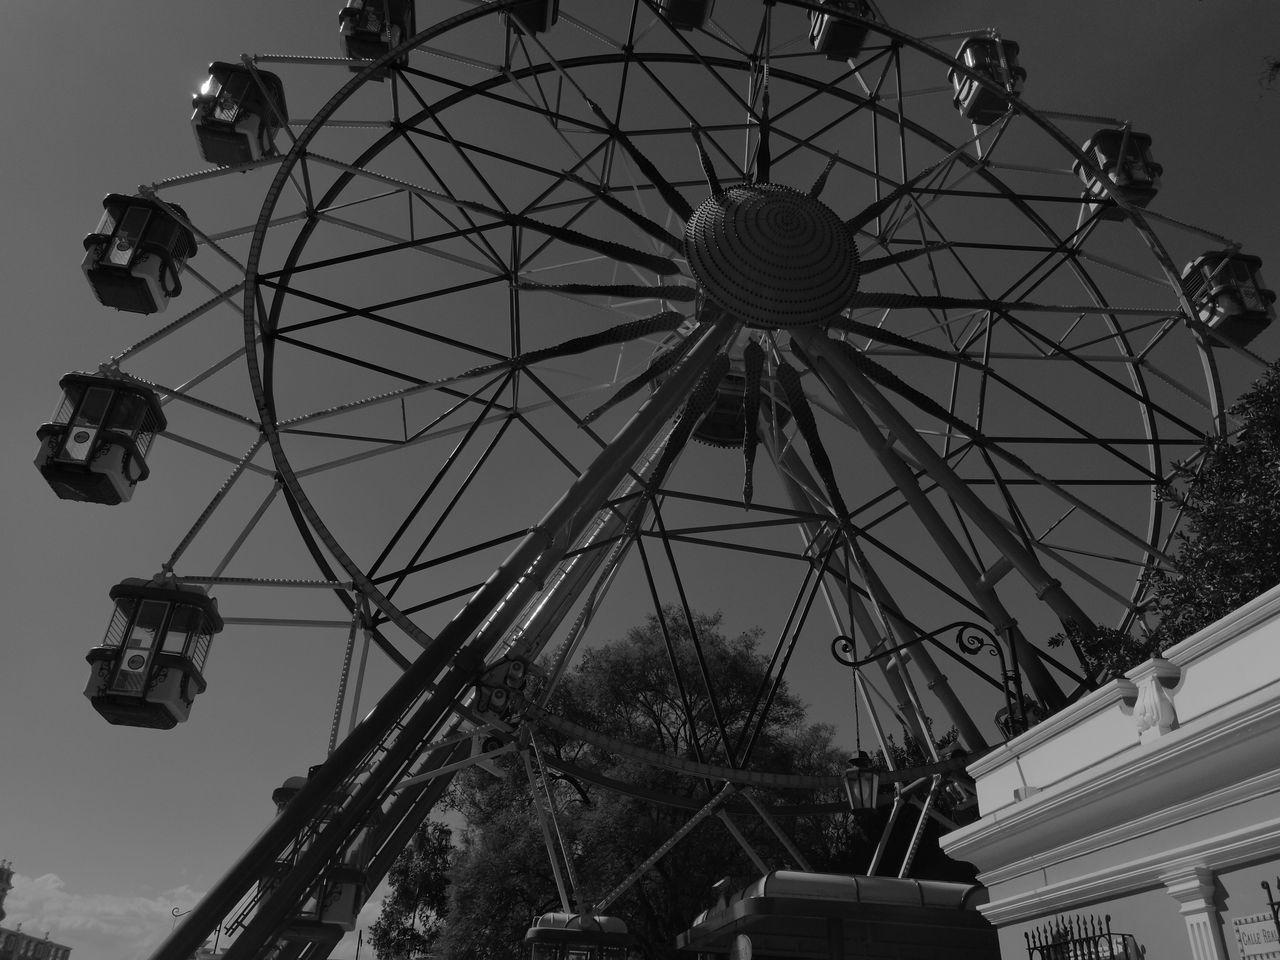 amusement park, arts culture and entertainment, amusement park ride, low angle view, fairground ride, leisure activity, ferris wheel, big wheel, sky, outdoors, no people, day, clear sky, carousel